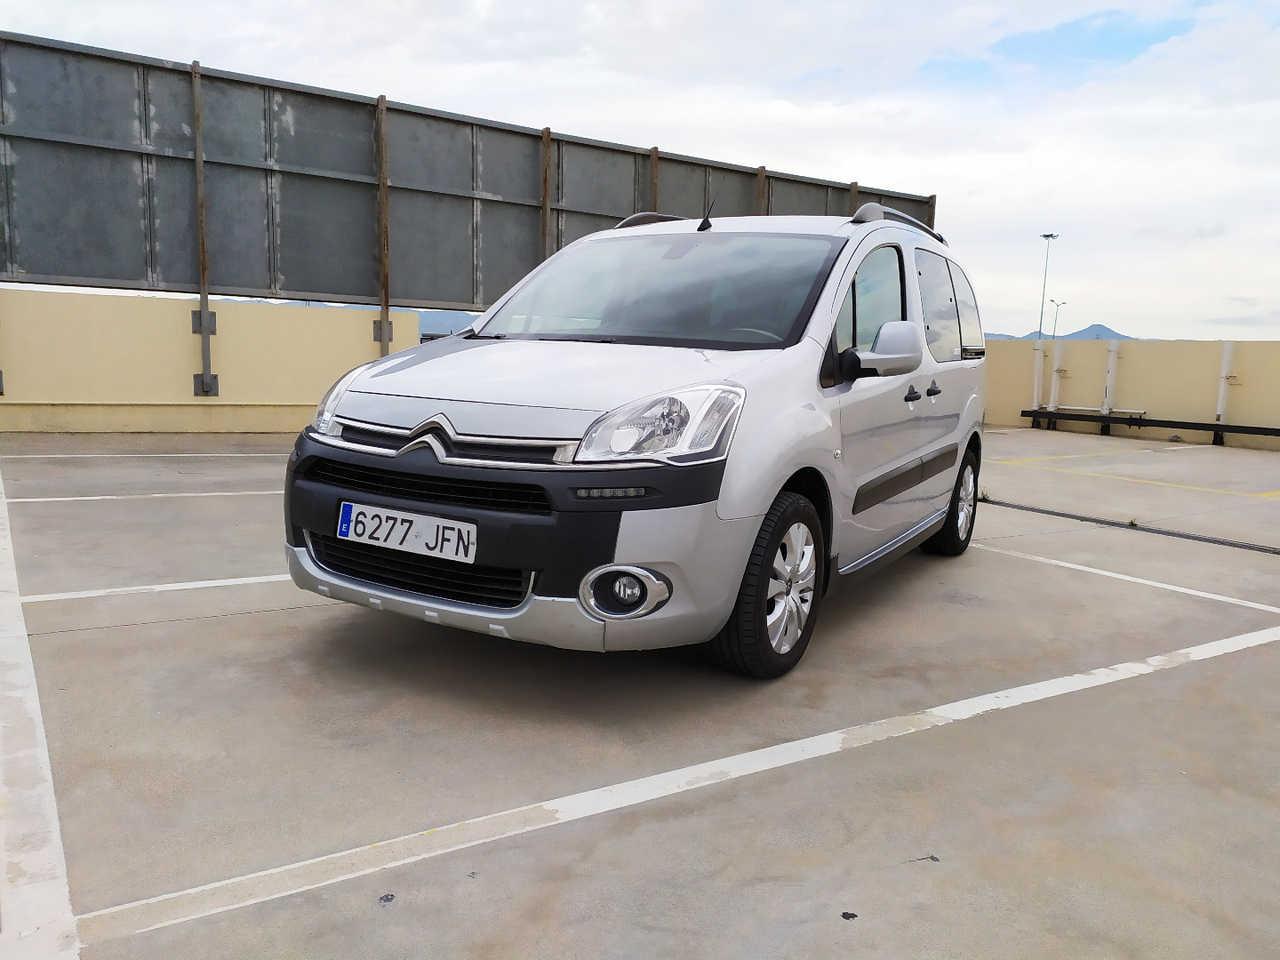 Citroën Berlingo XTR PLUS 7 PLAZAS 1.6HDI 92CV NAVI   - Foto 1